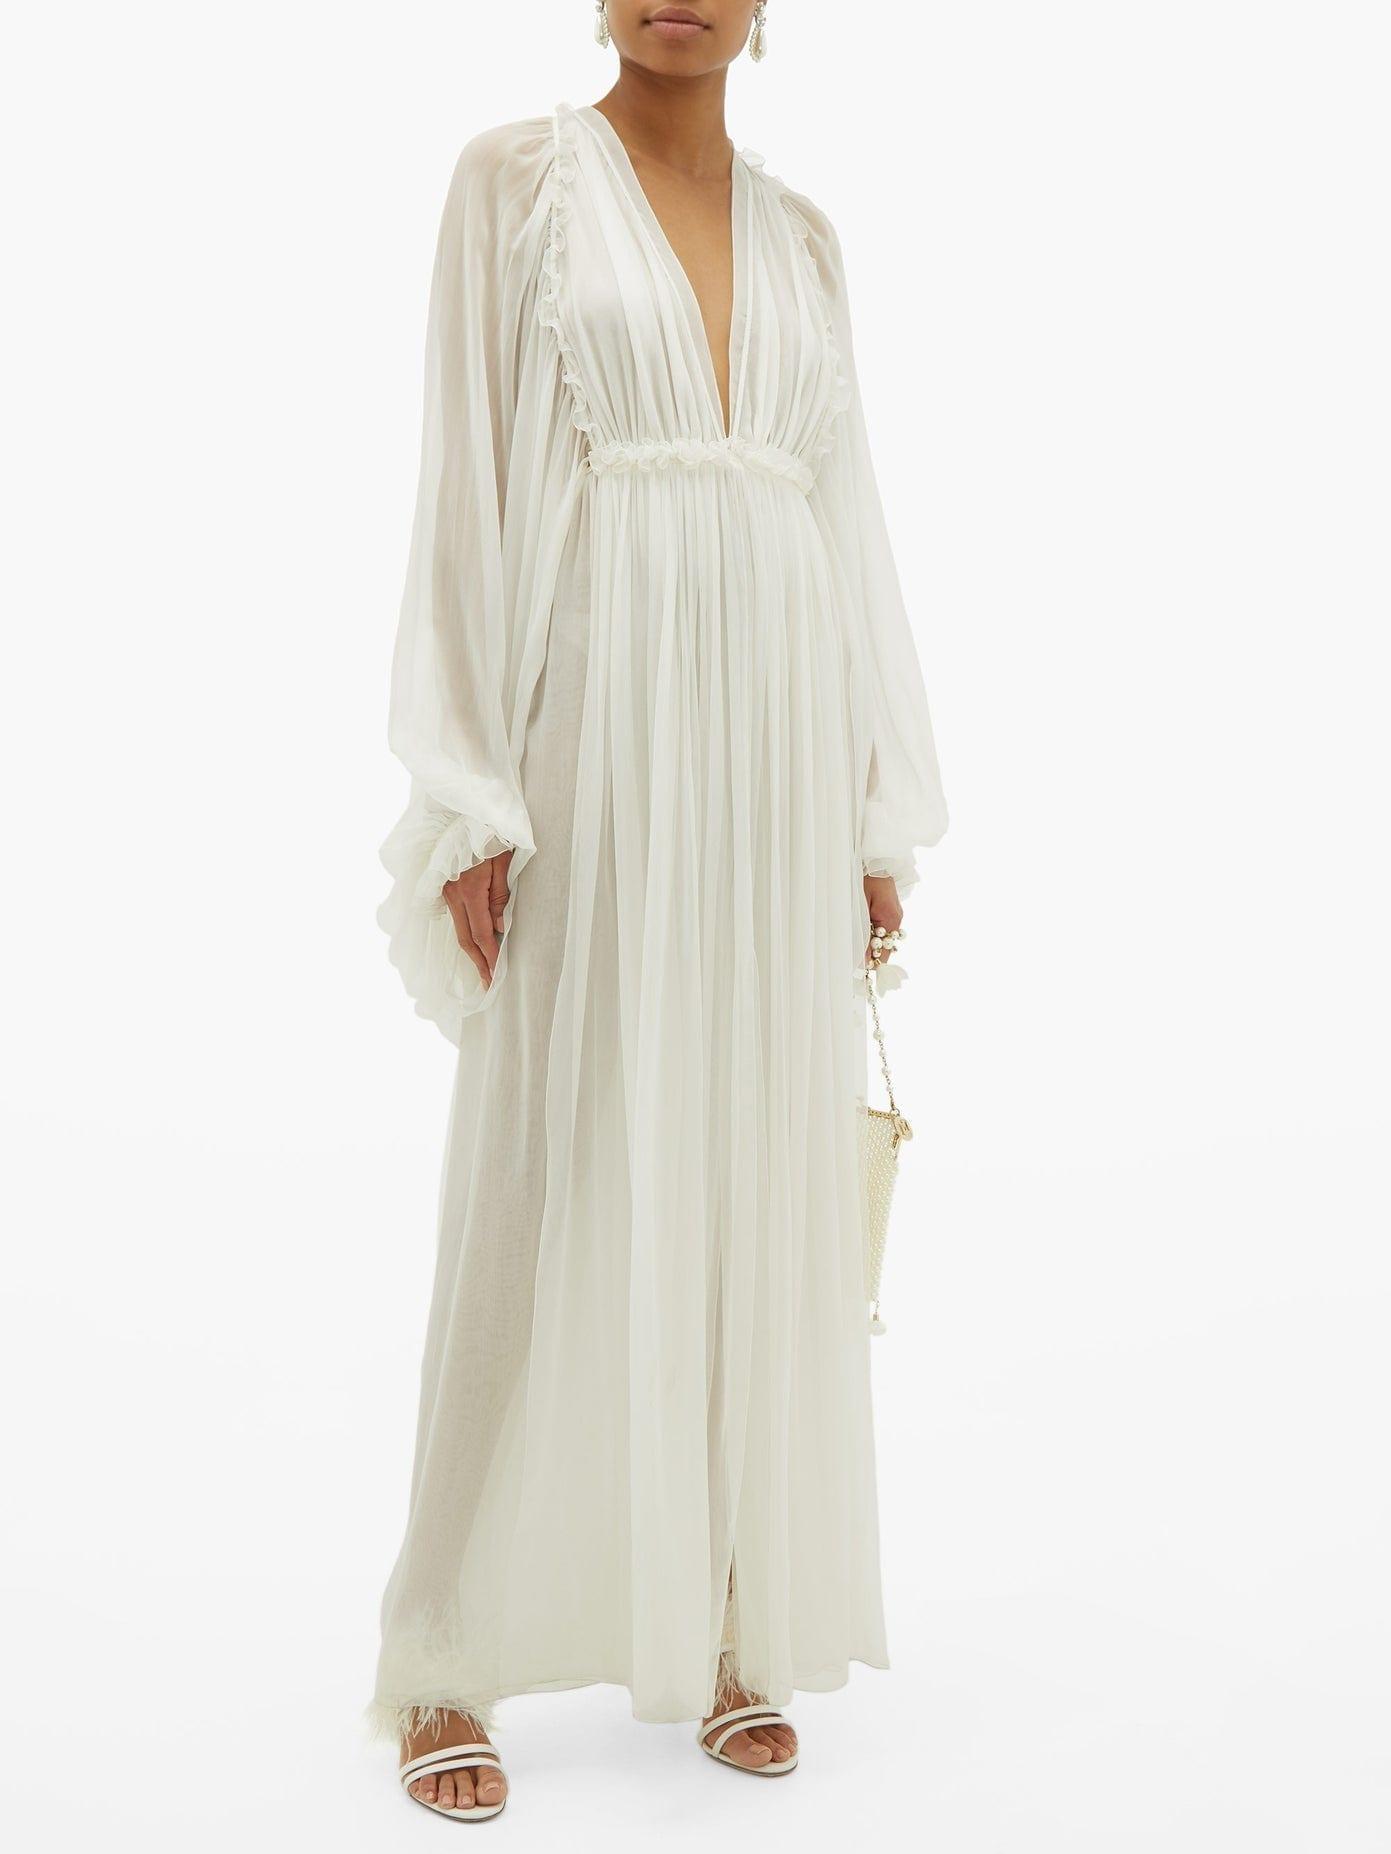 MAISON RABIH KAYROUZ Draped-Sleeve Empire-Waist Chiffon Gown